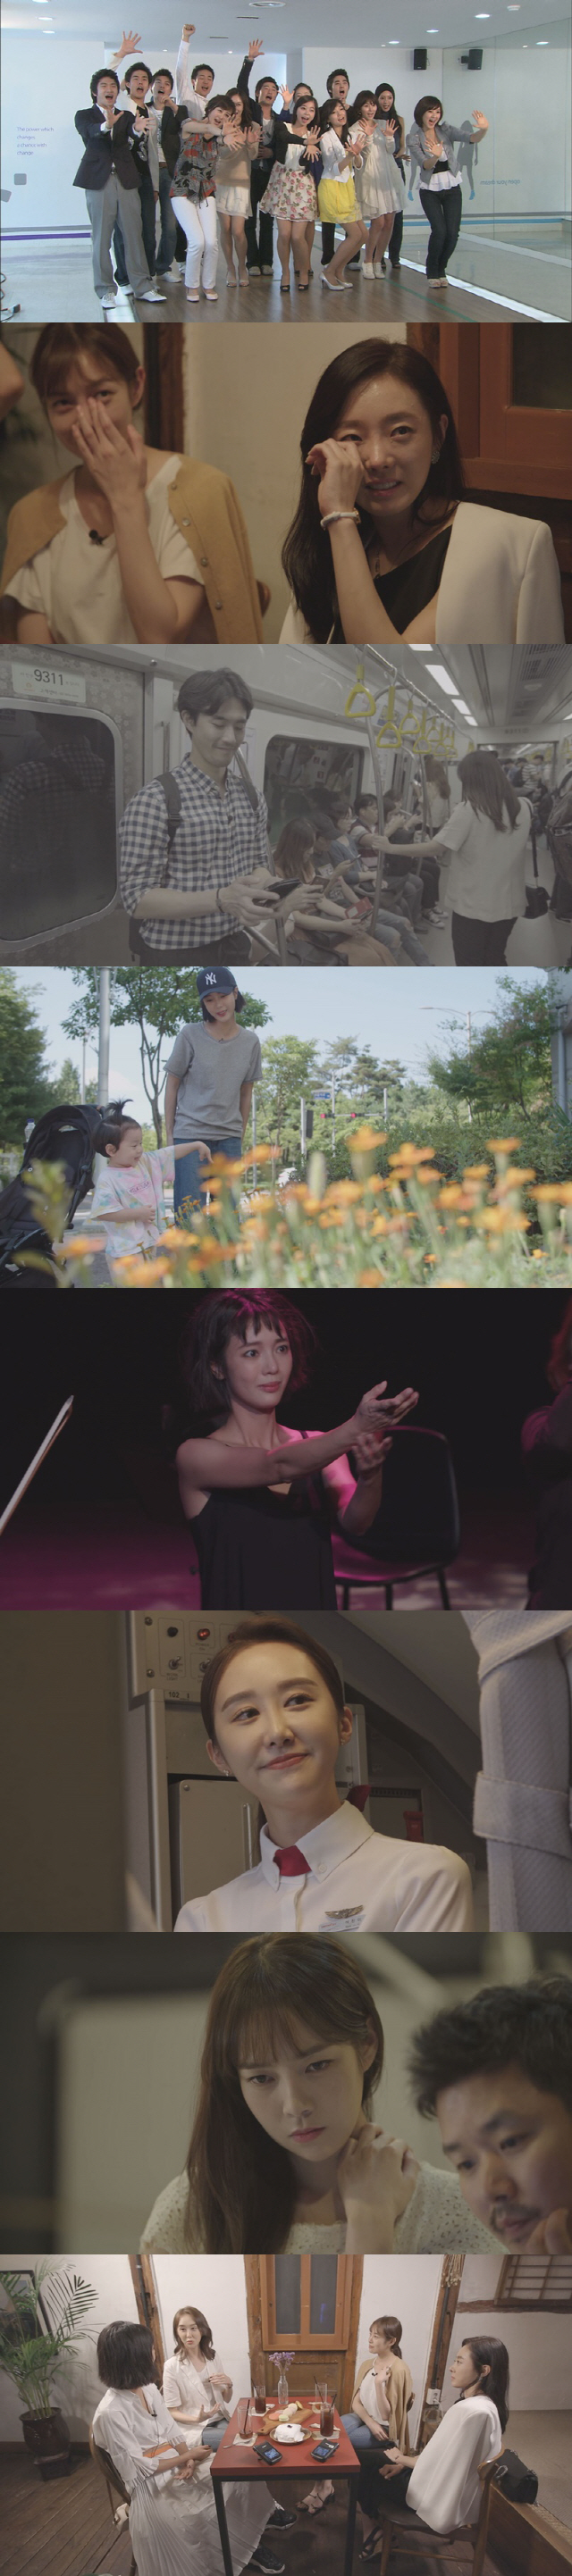 SBS 마지막 공채탤런트 '그 후 10년' ...꿈을 좇아본 사람들이라면 공감할 이야기